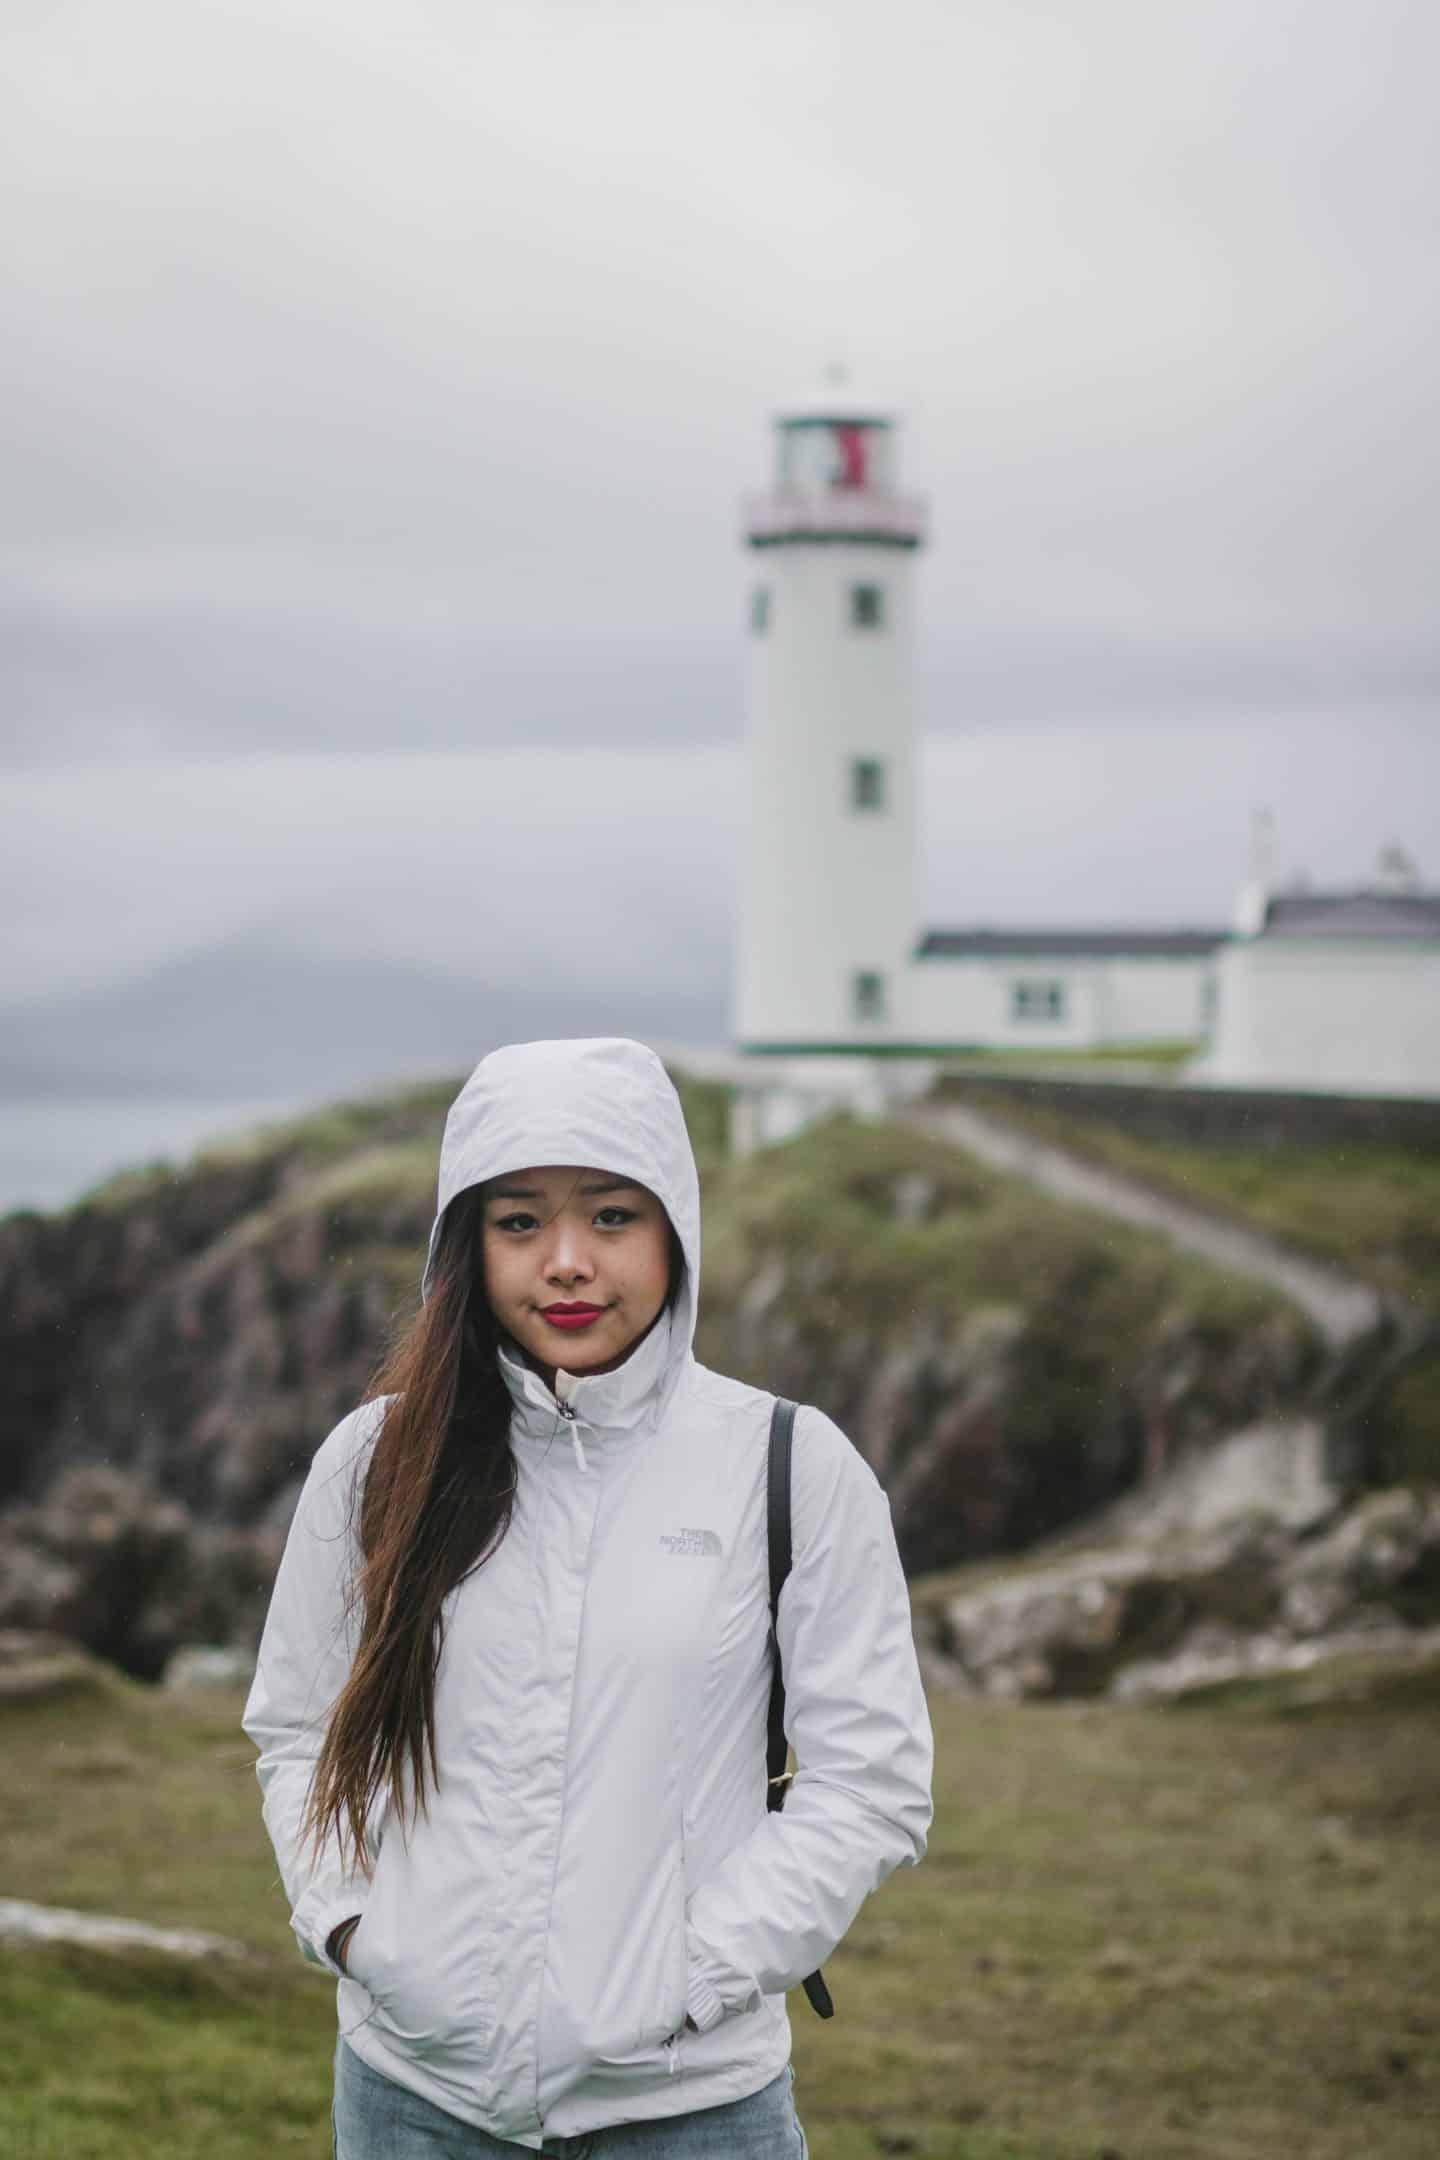 Fanad Head Lighthouse on the Fanad Peninsula in Ireland